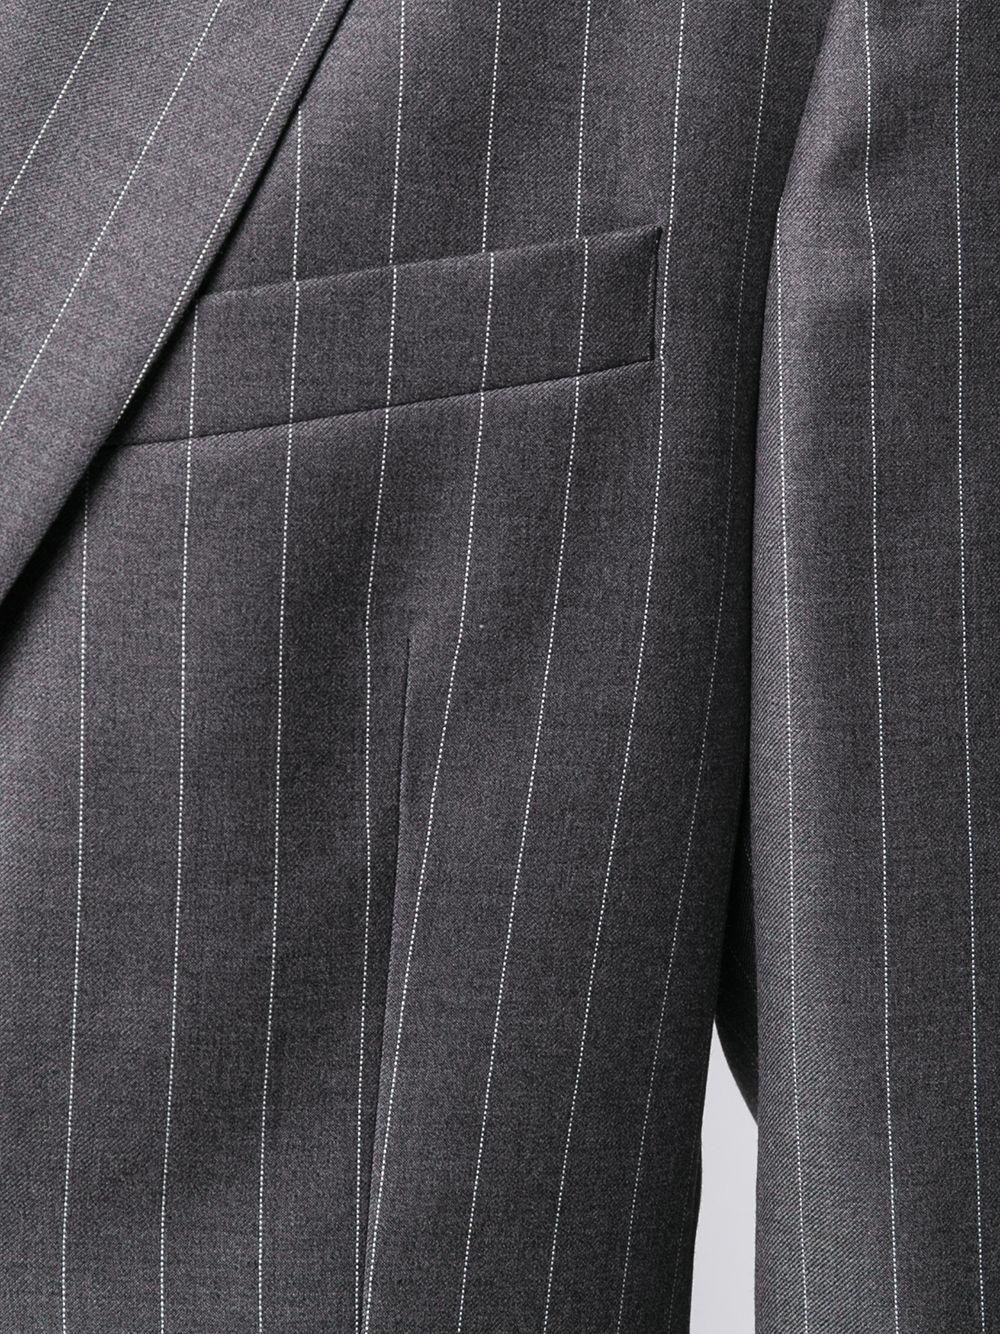 J. Lindeberg | J.Lindeberg пиджак Donnie в полоску | Clouty